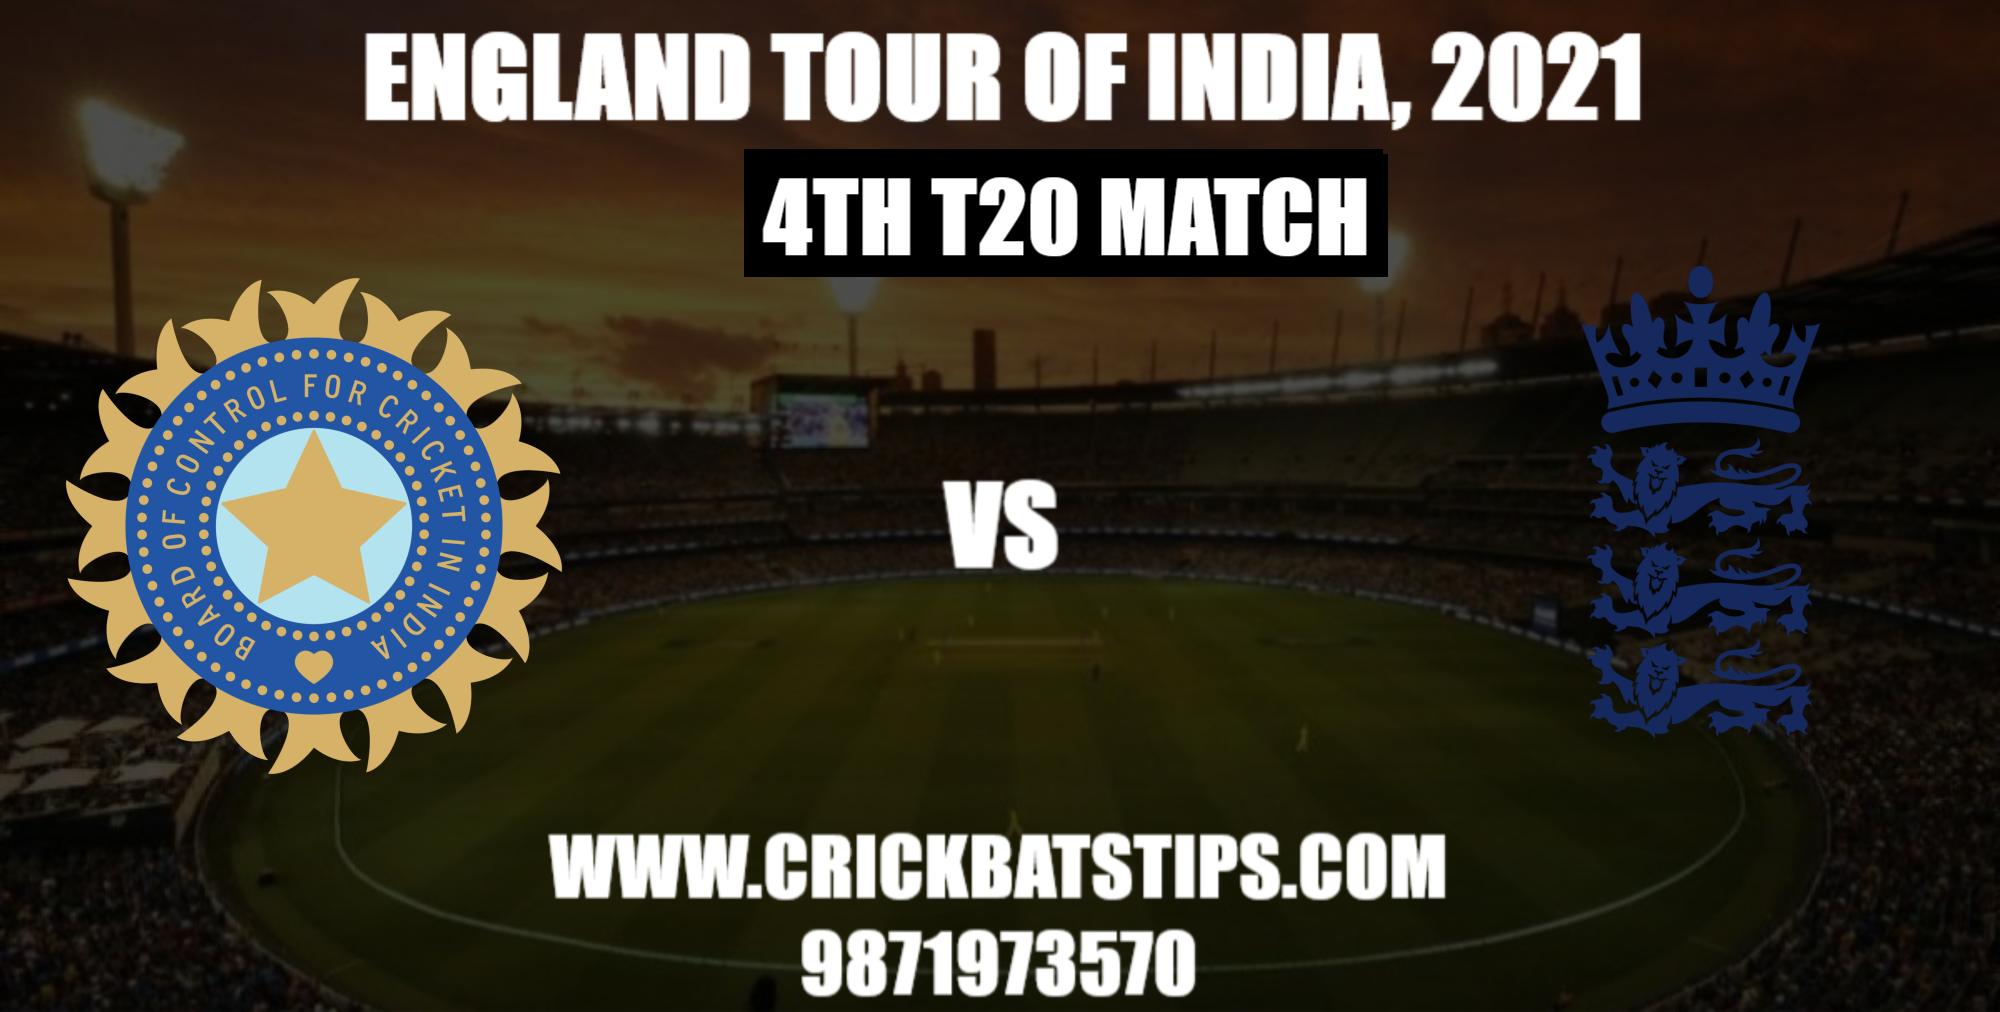 India-vs-England-4th-T20-Match-Winner-News-&-Predictions